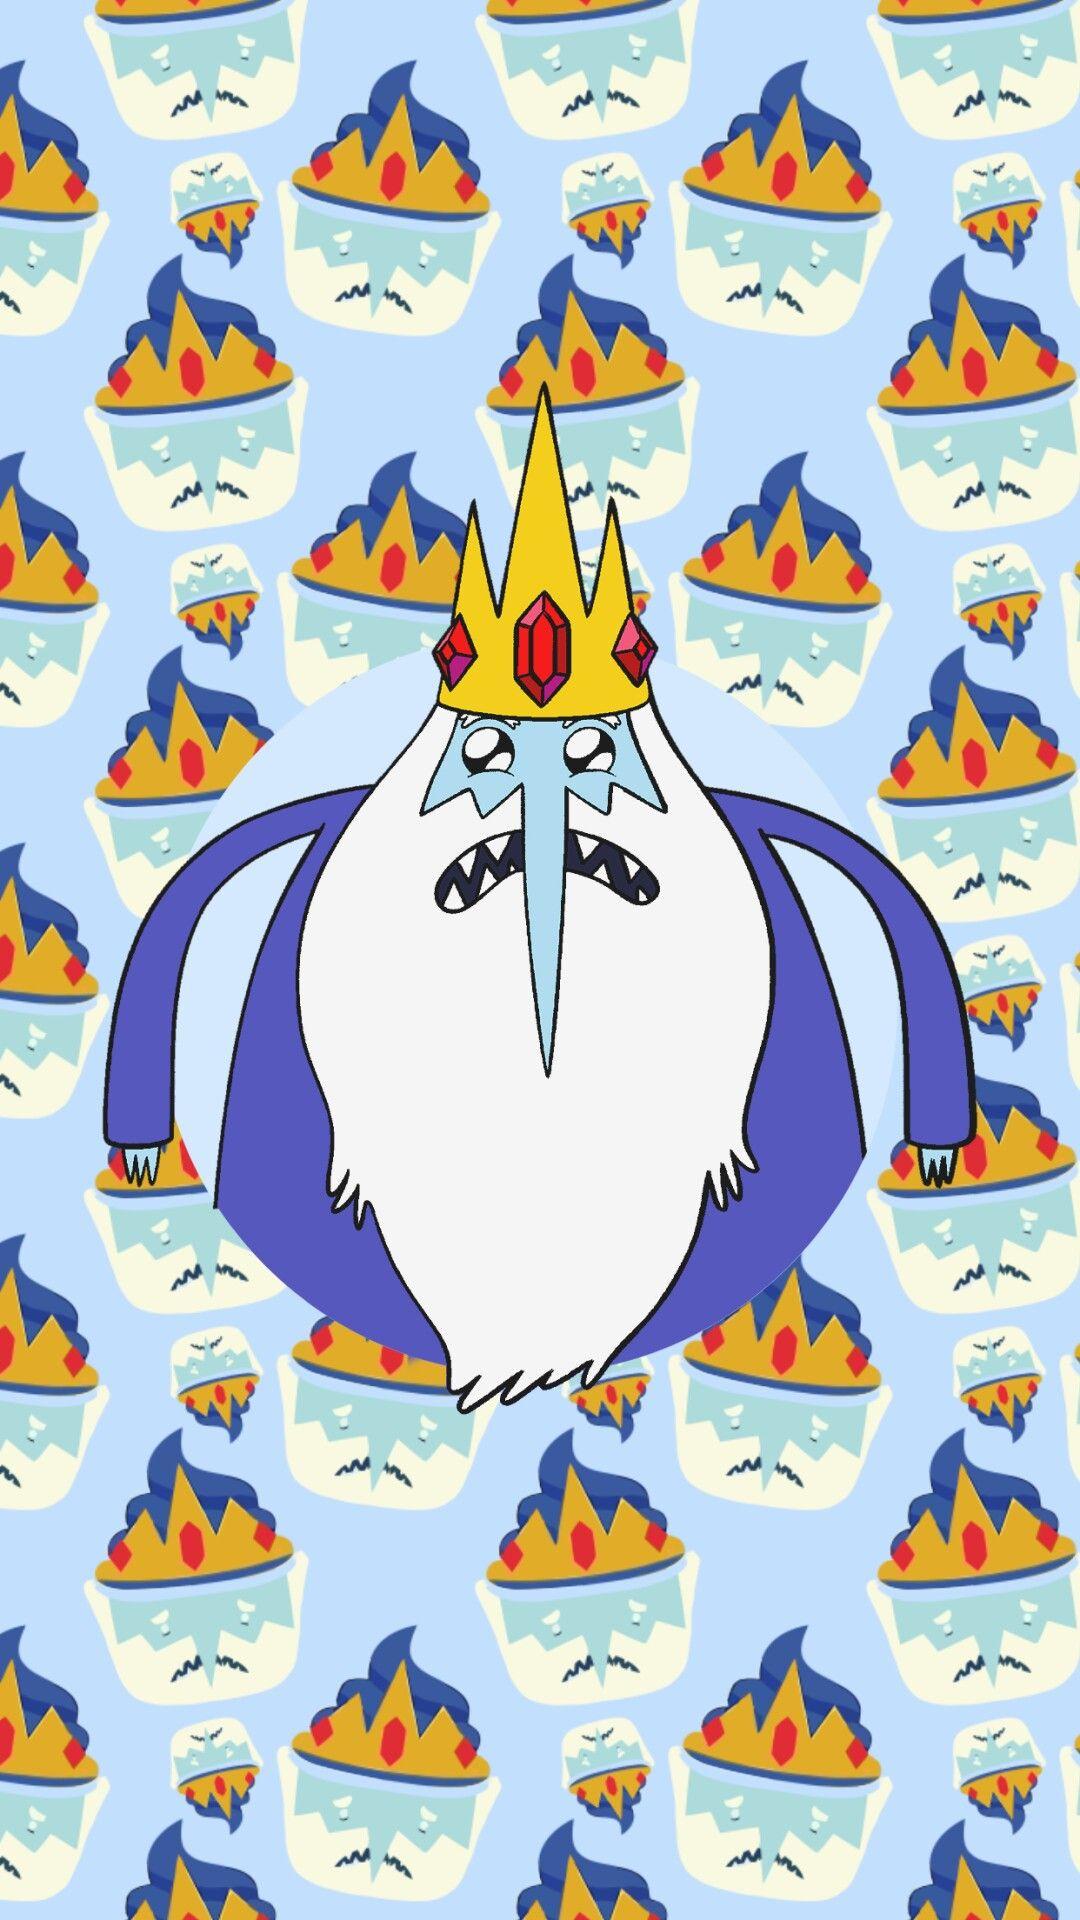 Ice King Wallpaper Sathitprasomsup Com Adventure Time